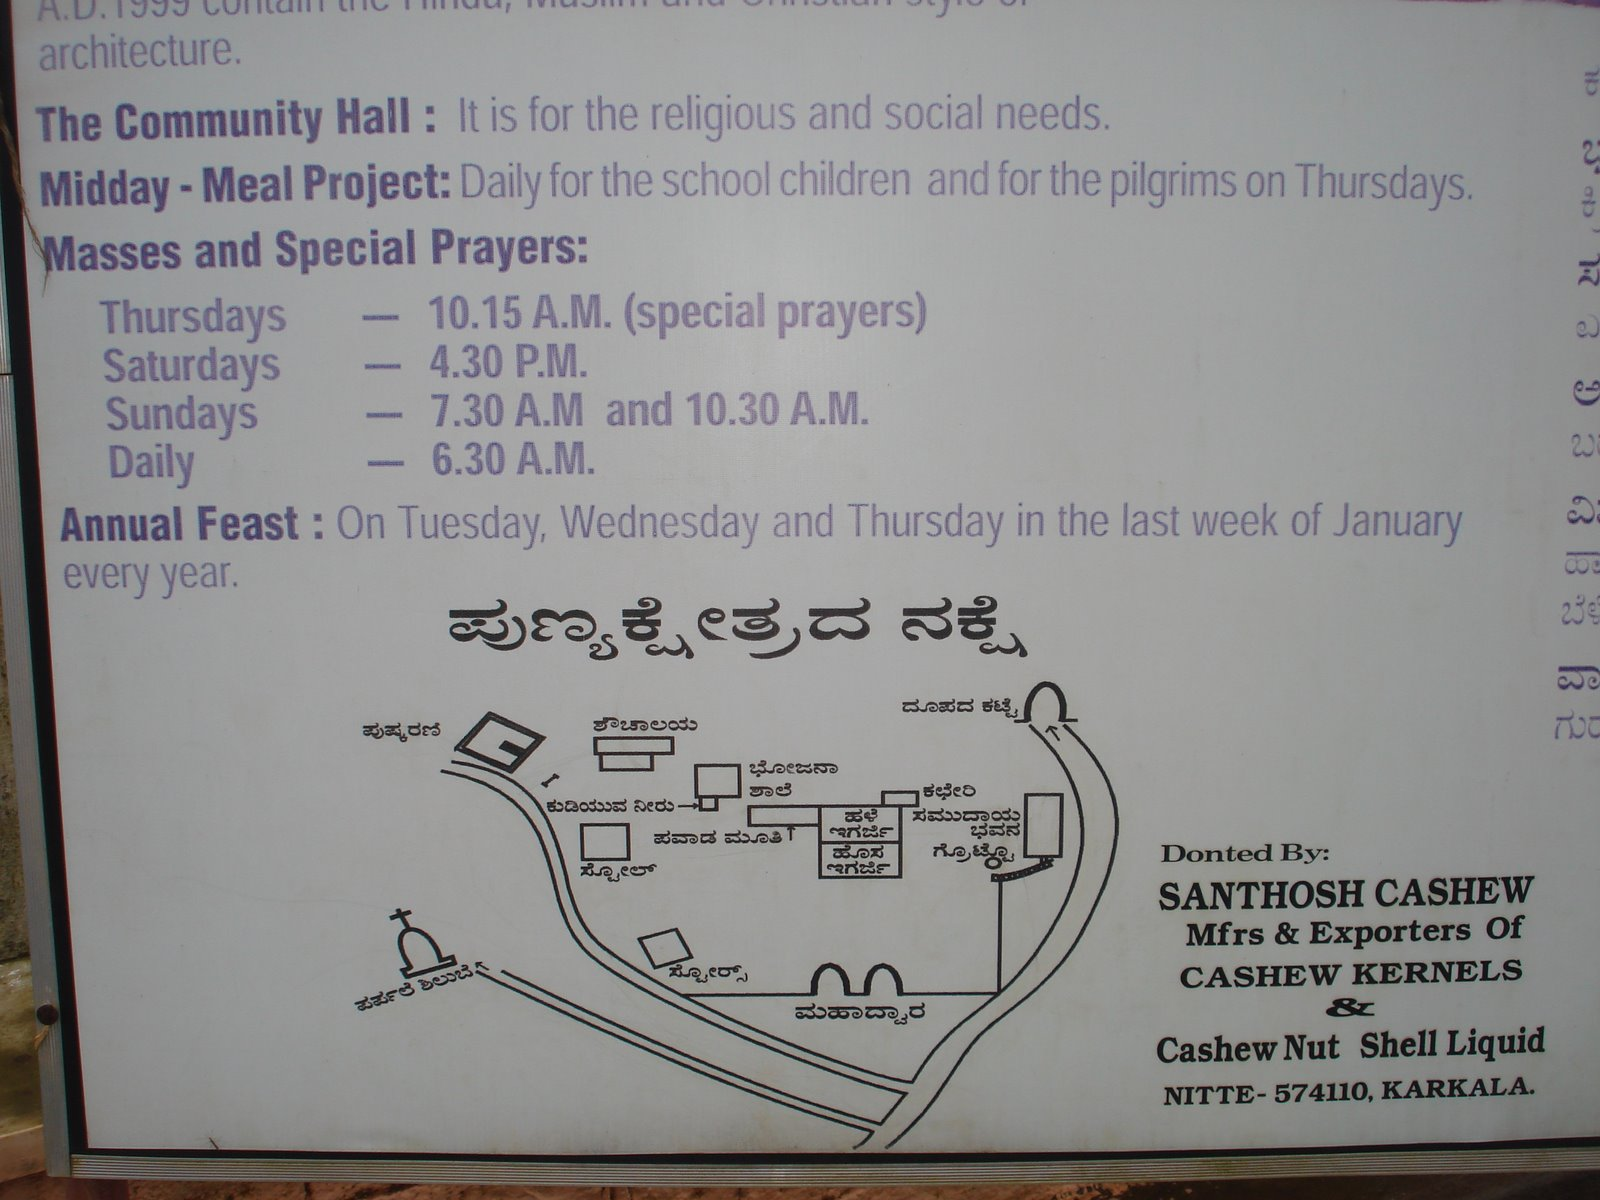 St Lwarence - mass timings